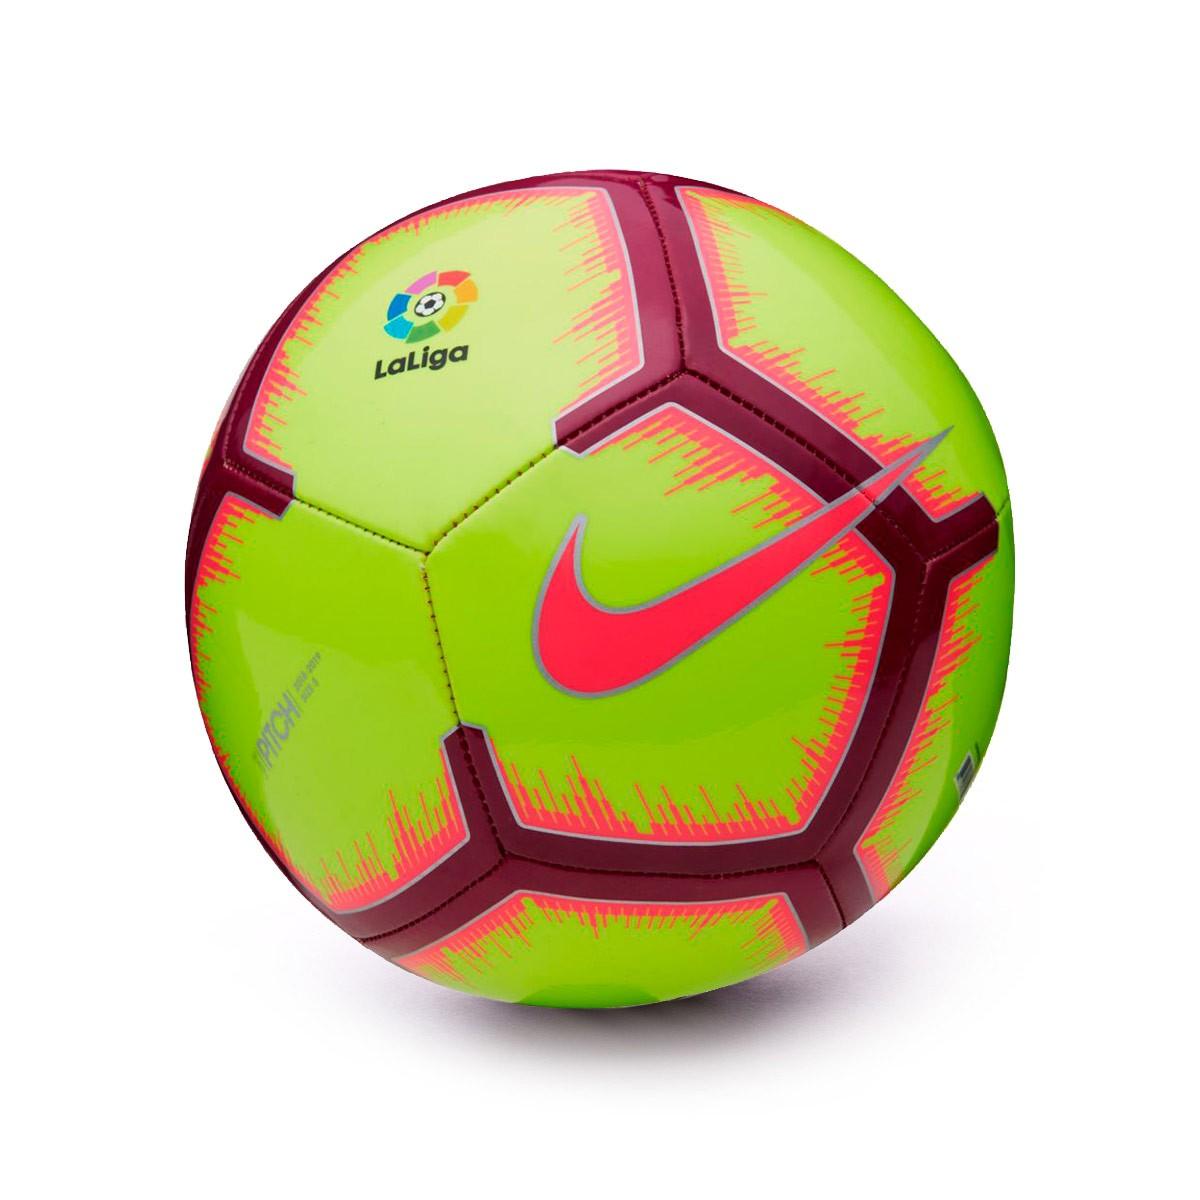 fea4ebd5659d7 Balón Nike La Liga Pitch 2018-2019 Volt-Pink flash-Team red - Tienda de  fútbol Fútbol Emotion